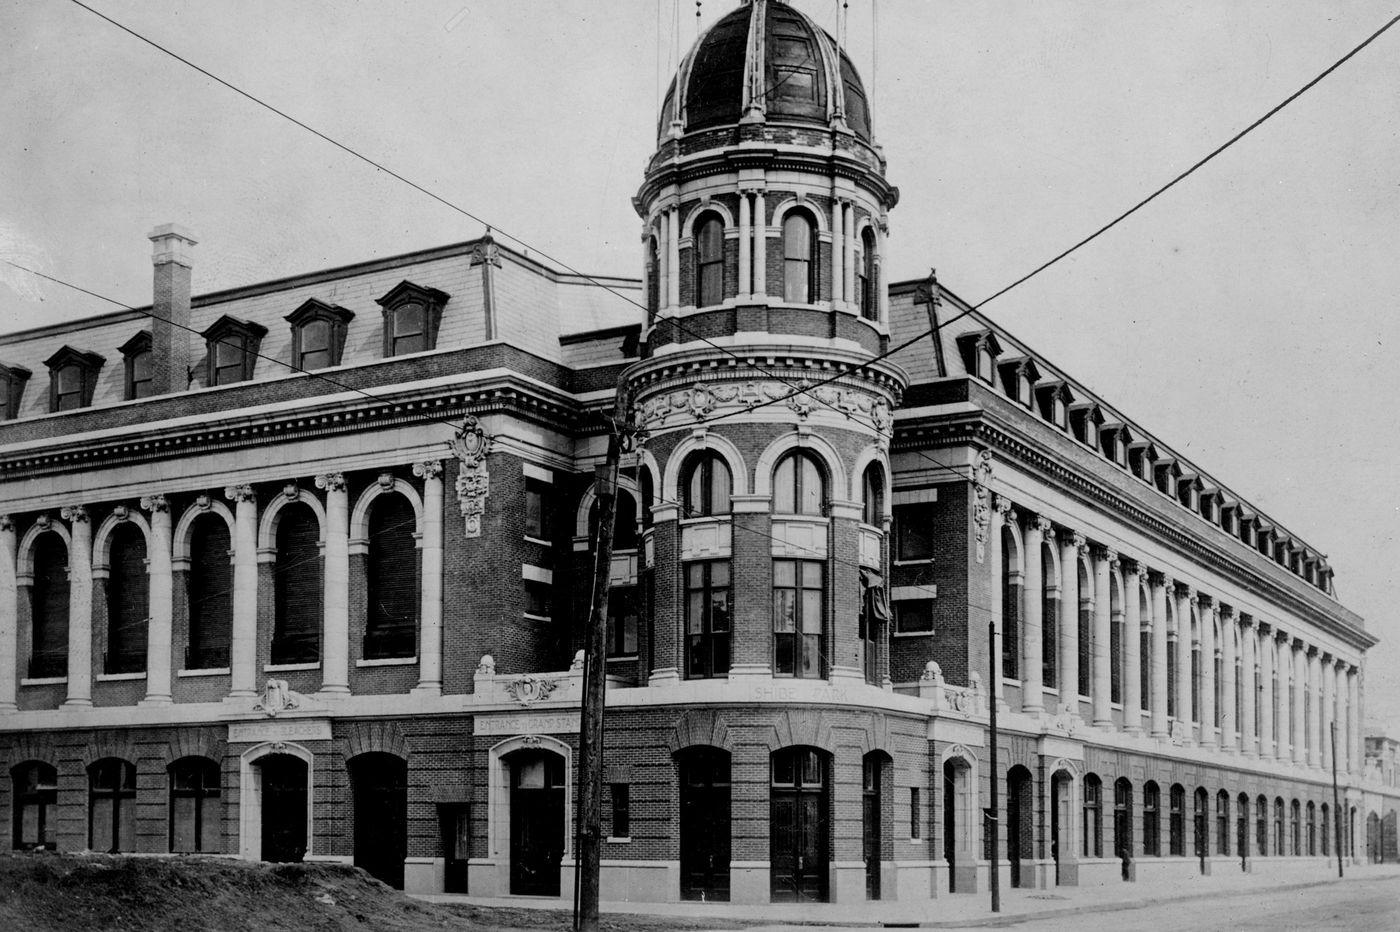 Ben Shibe once ruled Philadelphia baseball. But like the ballpark he built, his legacy has disappeared.